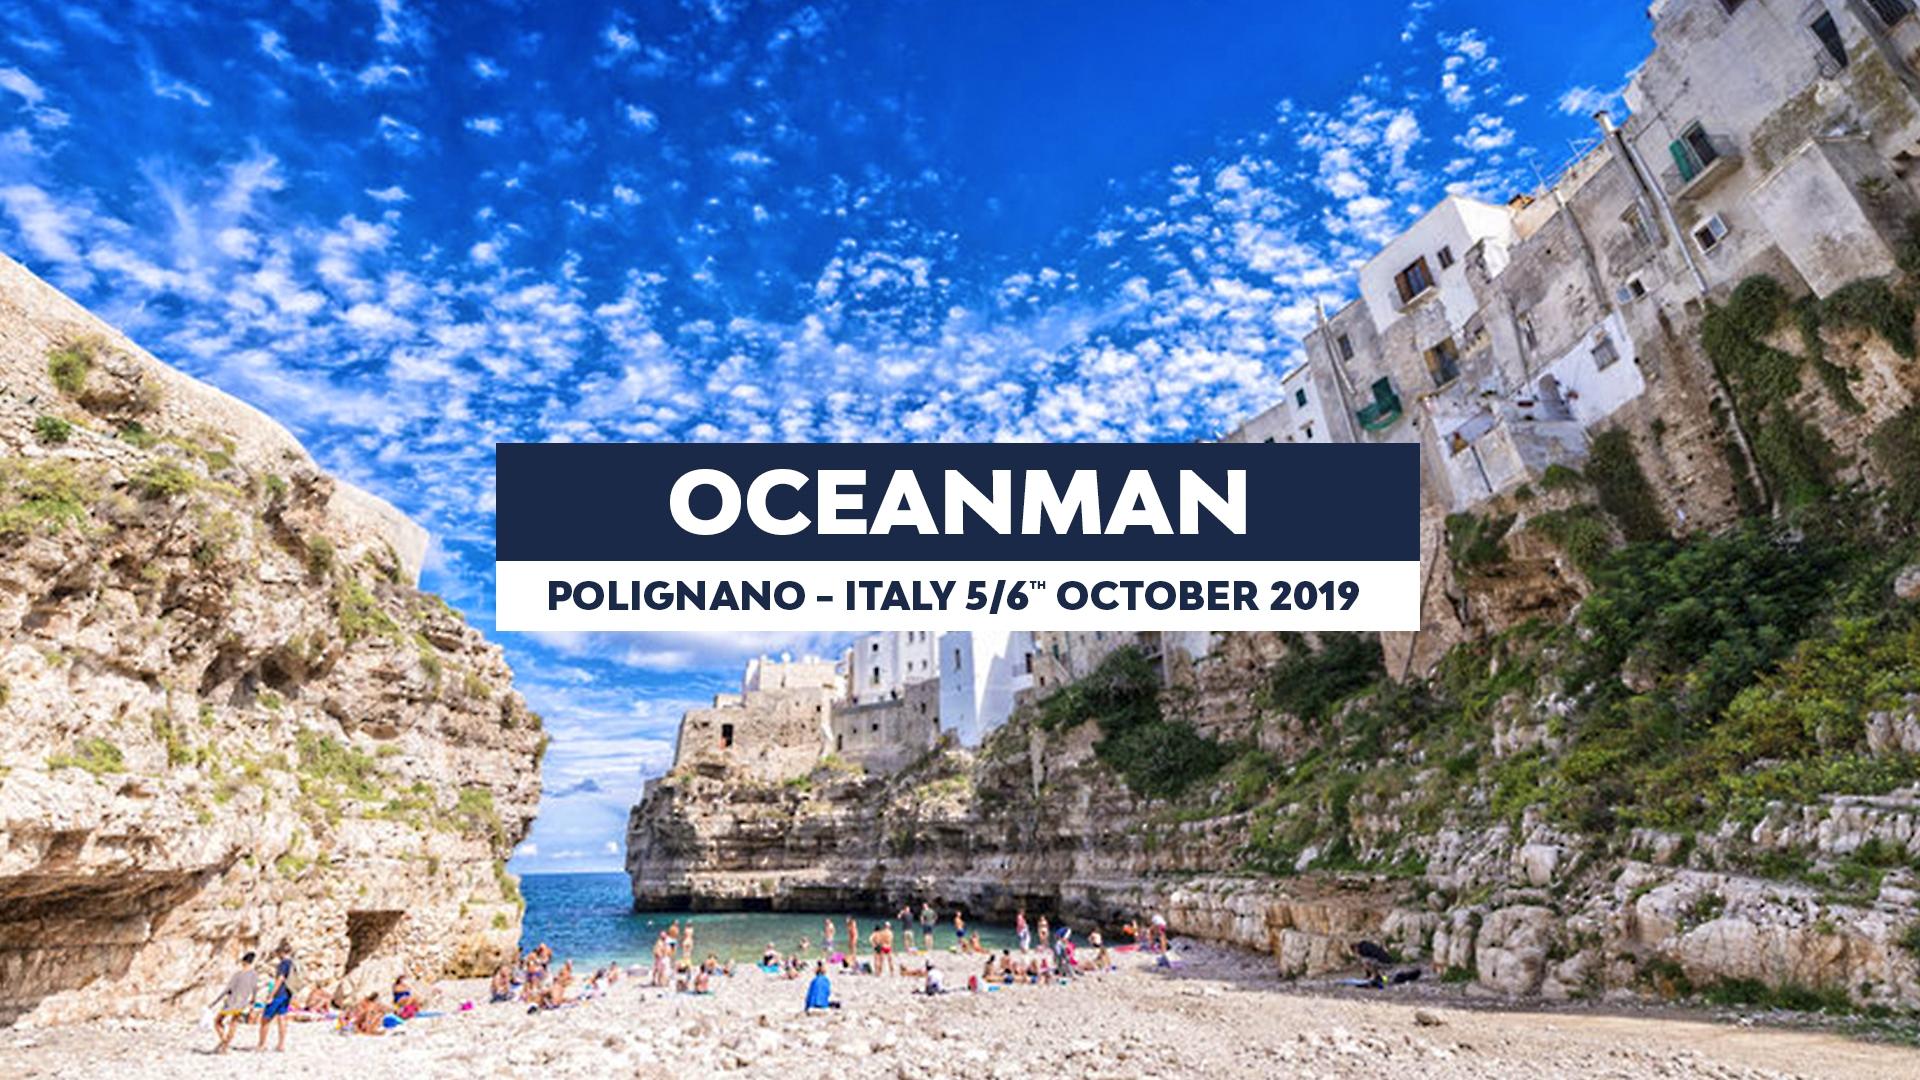 OCEANMAN POLIGNANO - ITALY 19